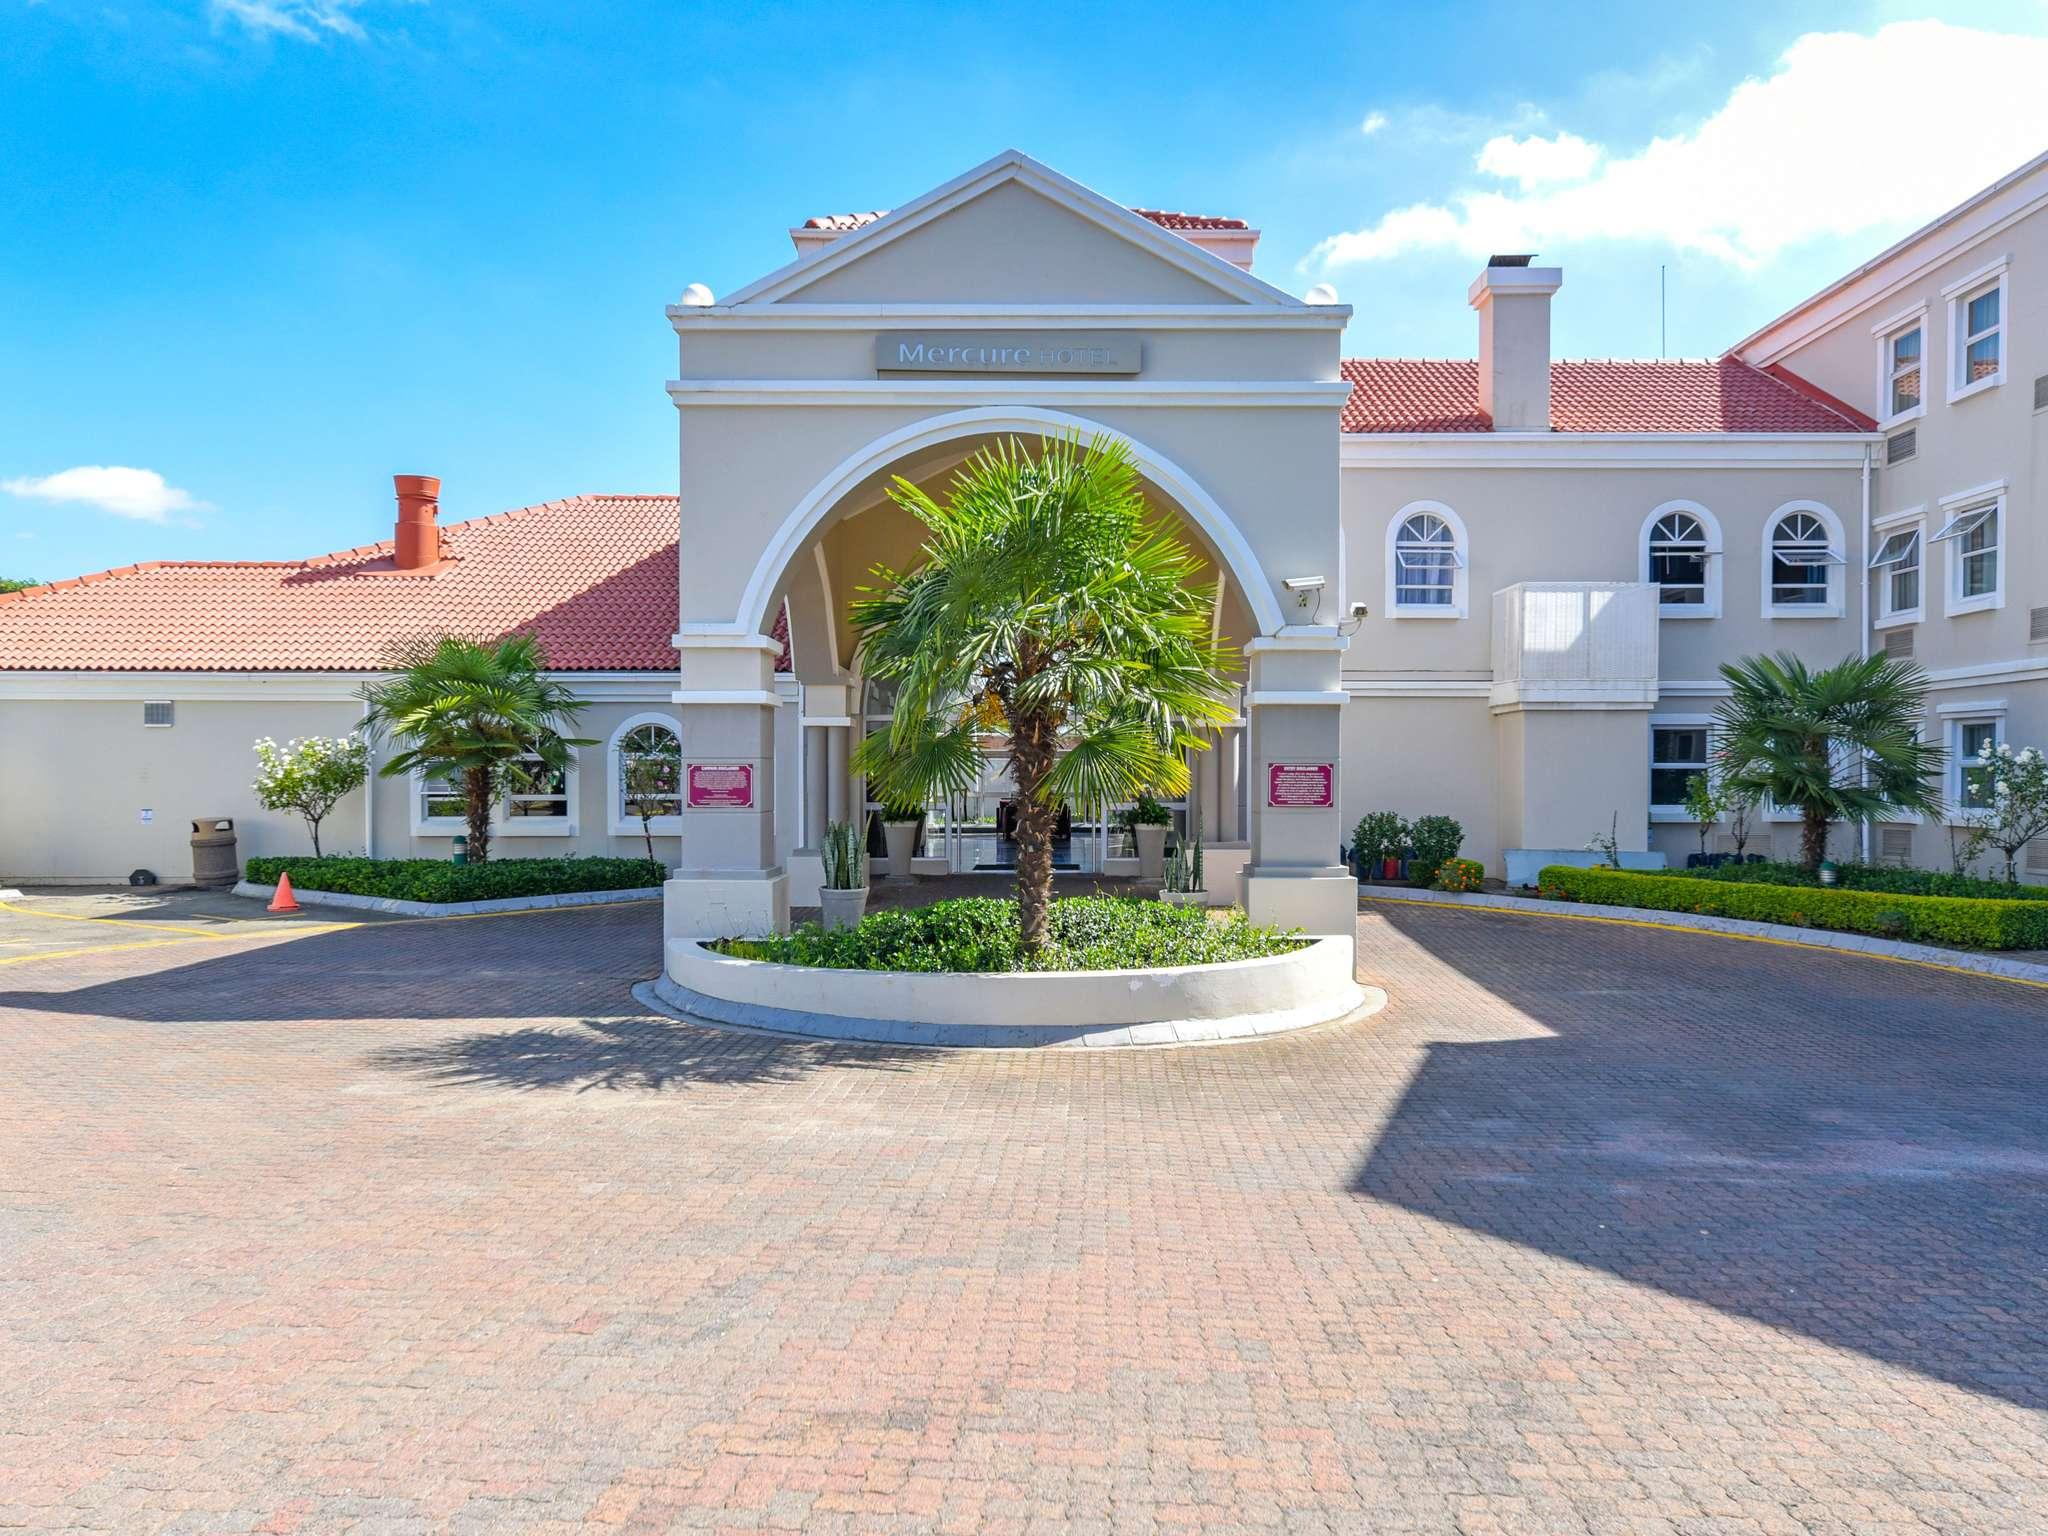 Otel – Mercure Johannesburg Randburg Hotel